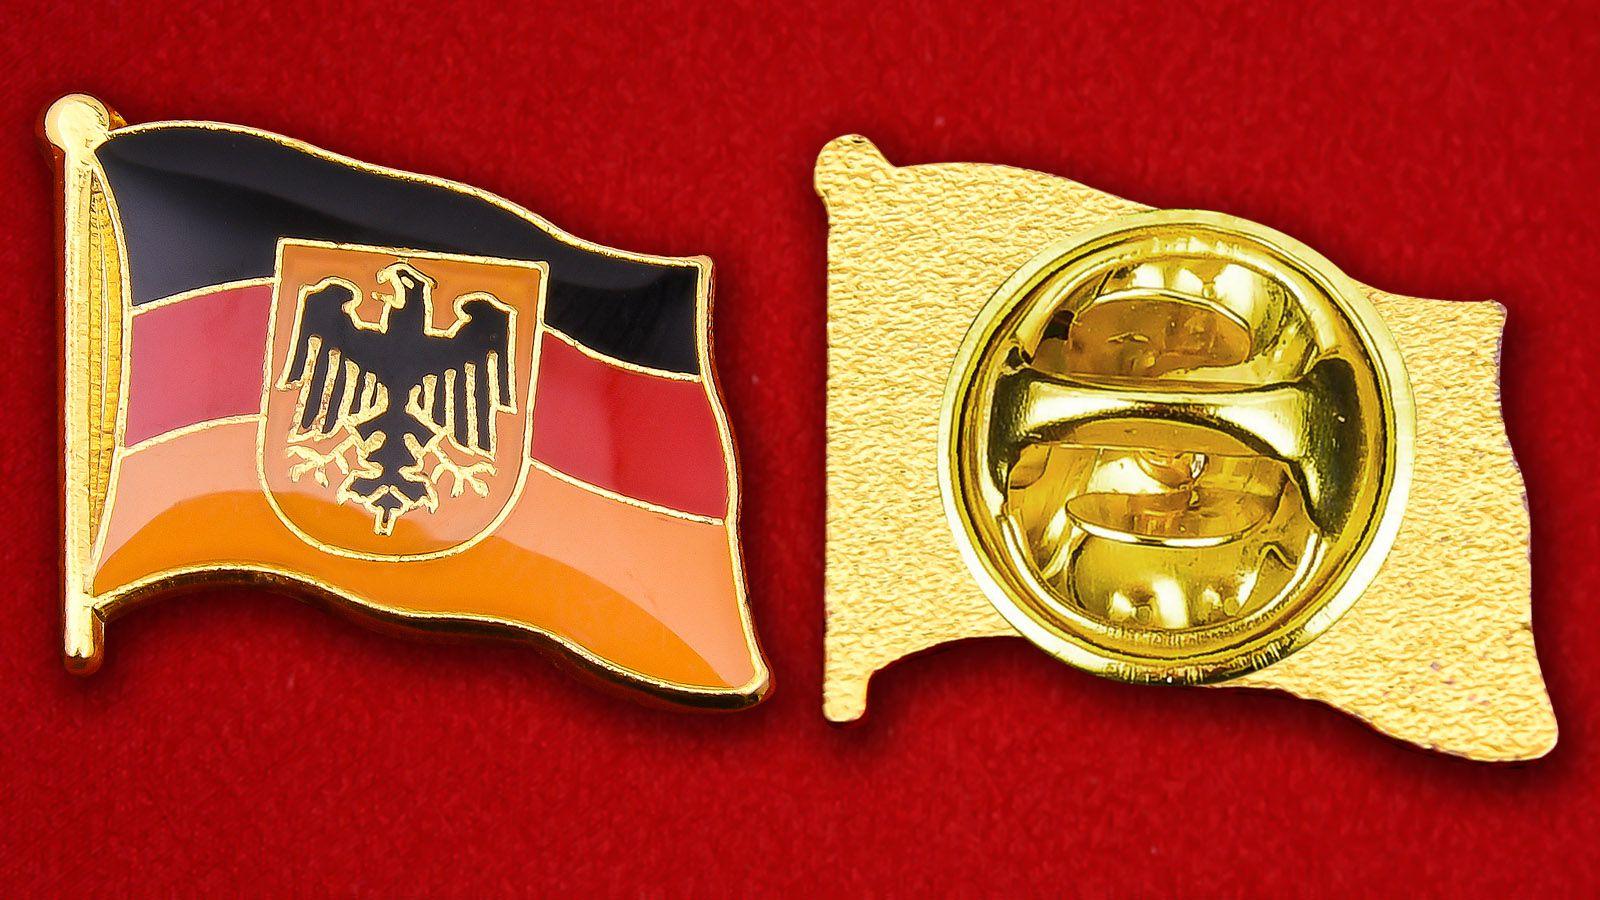 Значок Флага Германии с гербом - аверс и реверс